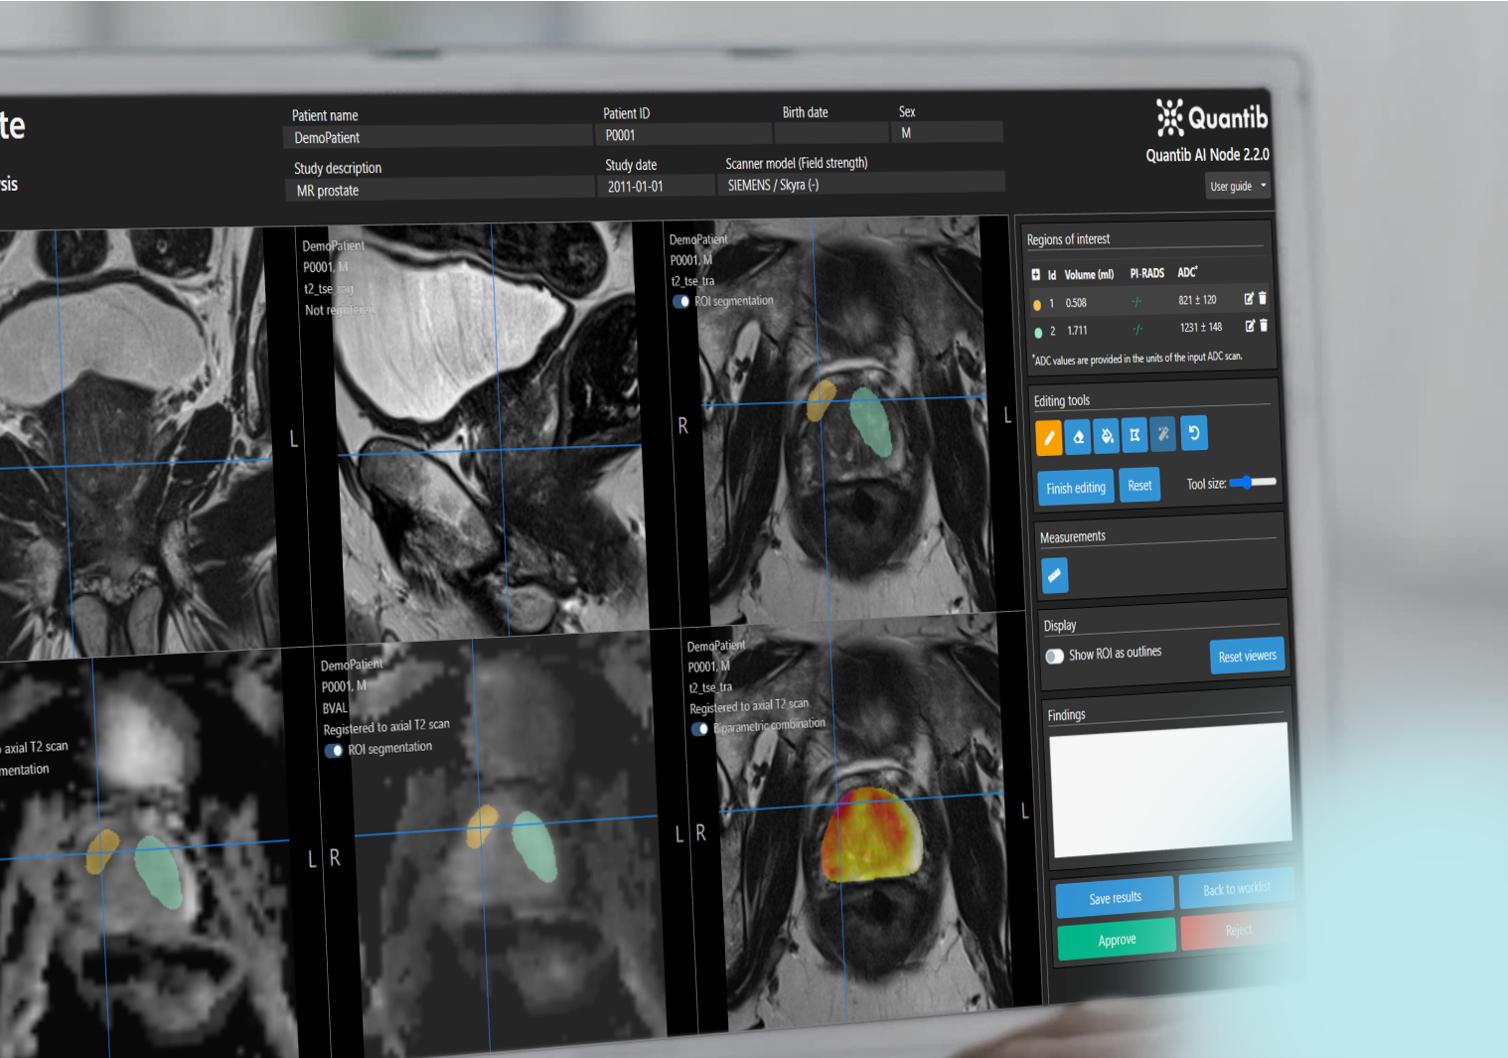 prostate radiology software Quantib Prostate user interface on desktop monitor showing ROI segmentation